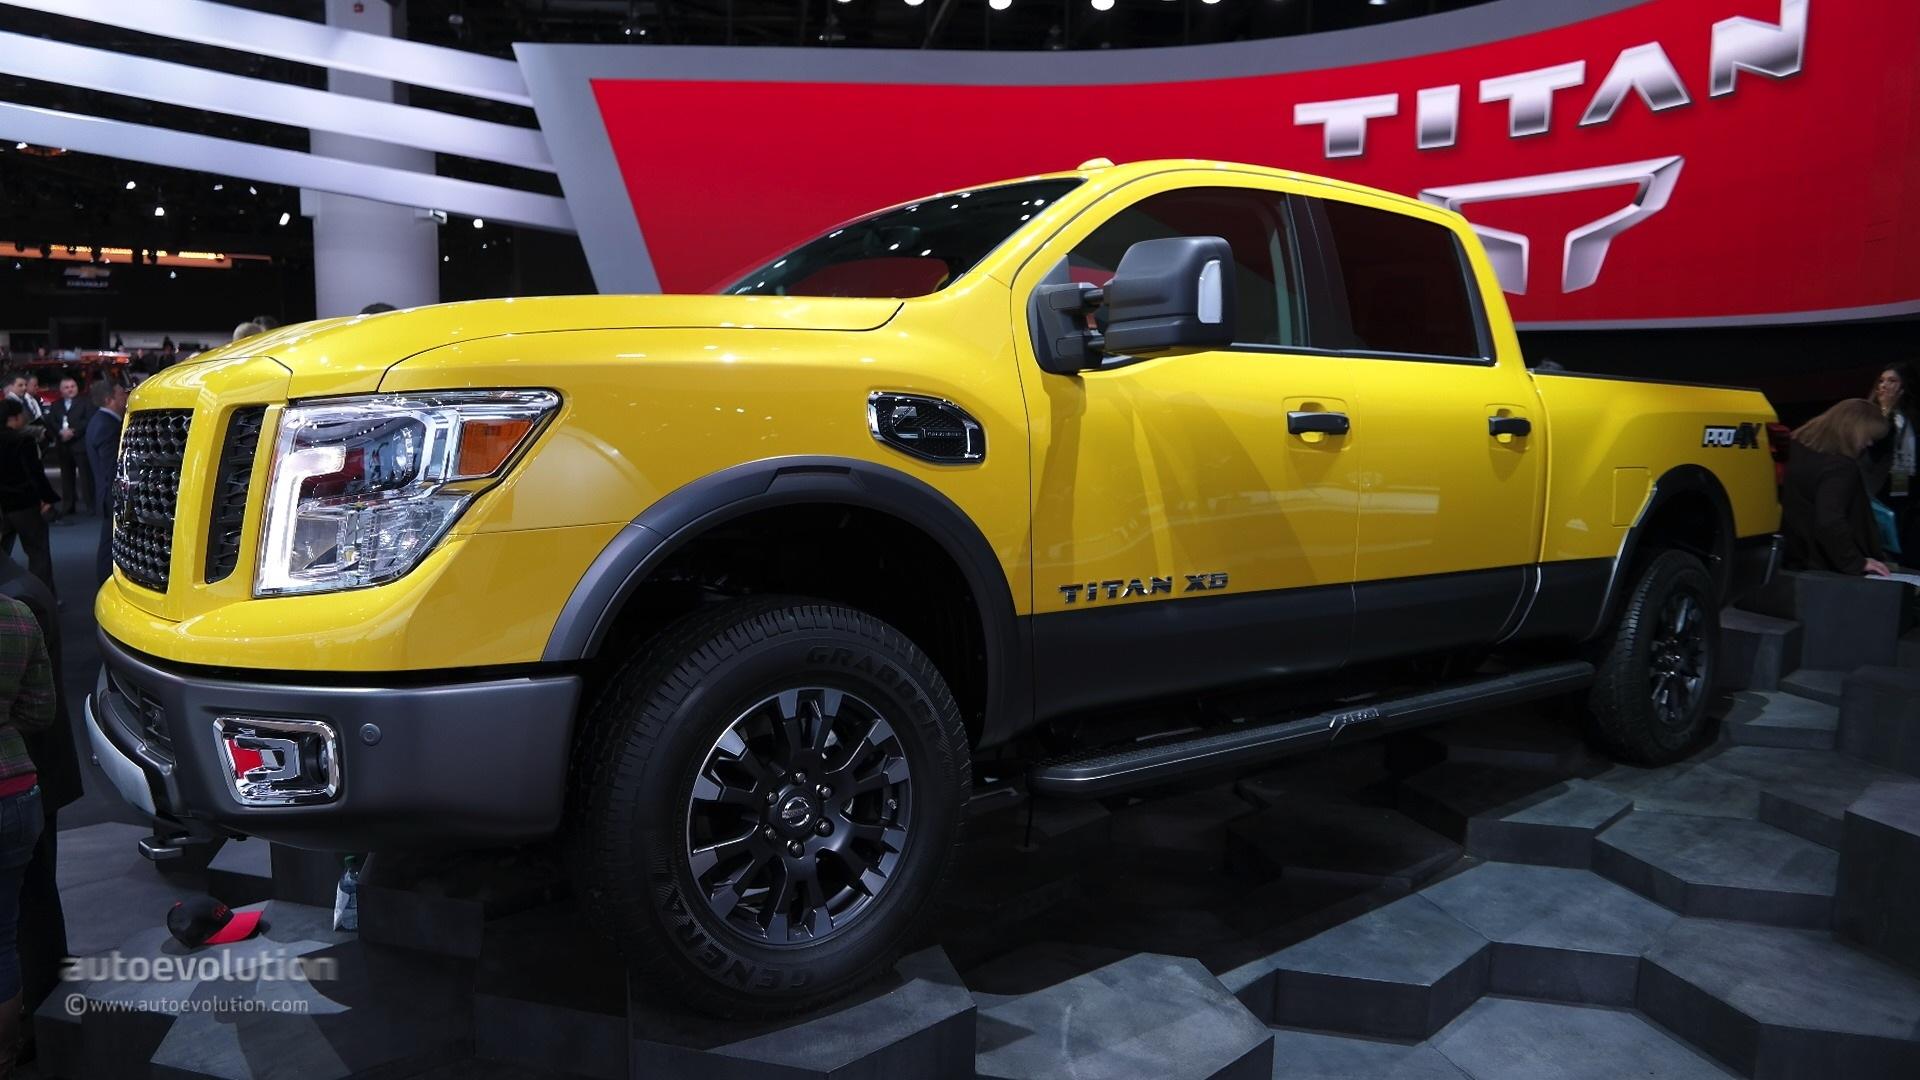 2016 nissan titan xd cummins light duty truck has heavy duty attitude at detroit live photos. Black Bedroom Furniture Sets. Home Design Ideas